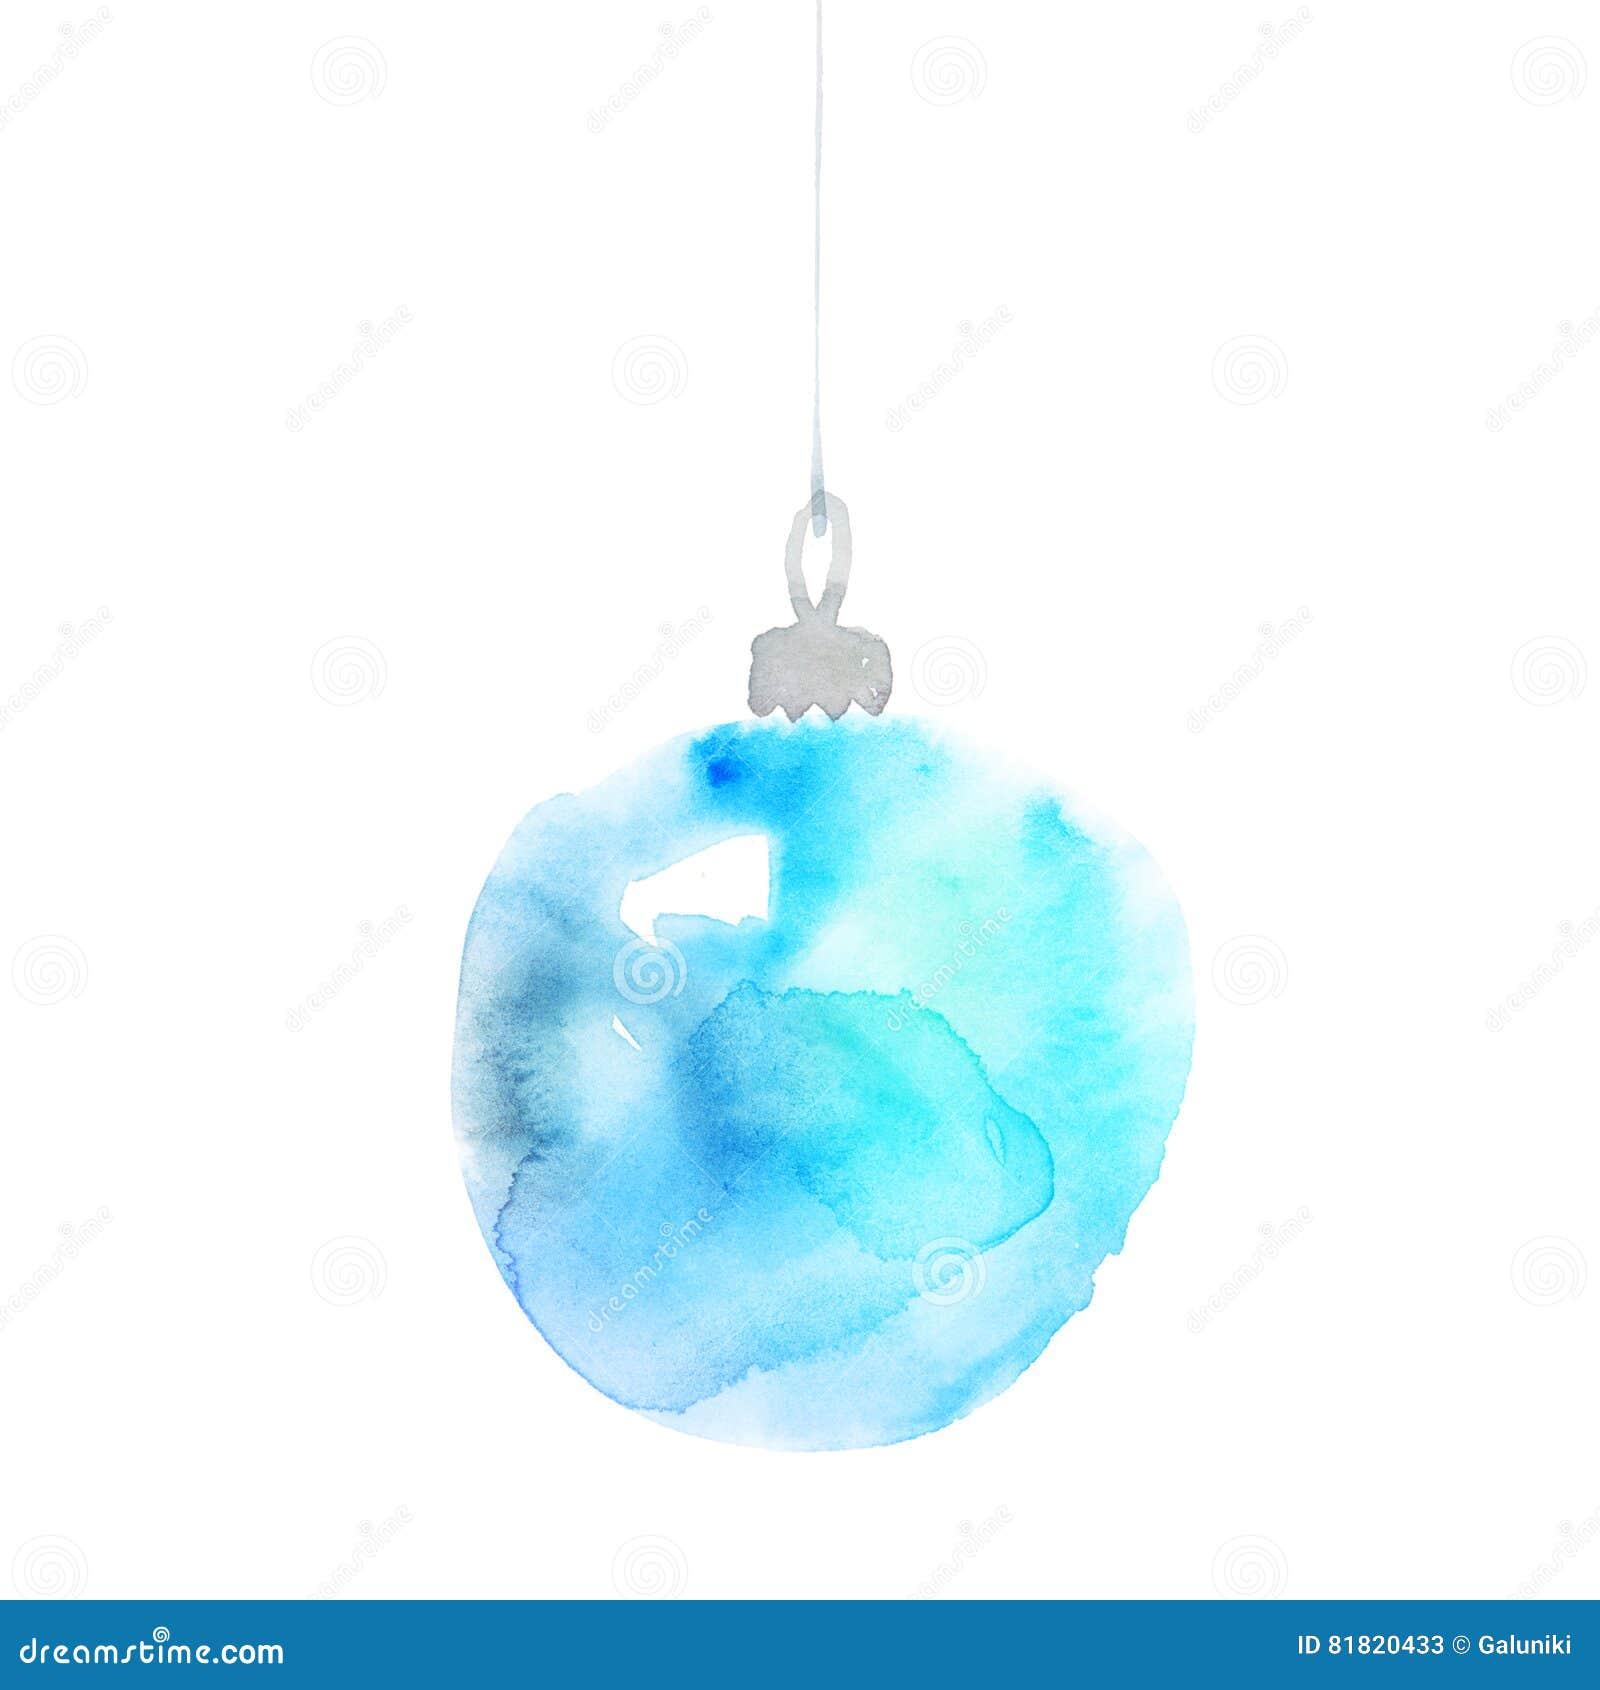 Hand Painted Elegant Xmas Bubbles Decor Cute Simple Christmas Tree Bulbs Decoration Design Element New Tear Decorative Background